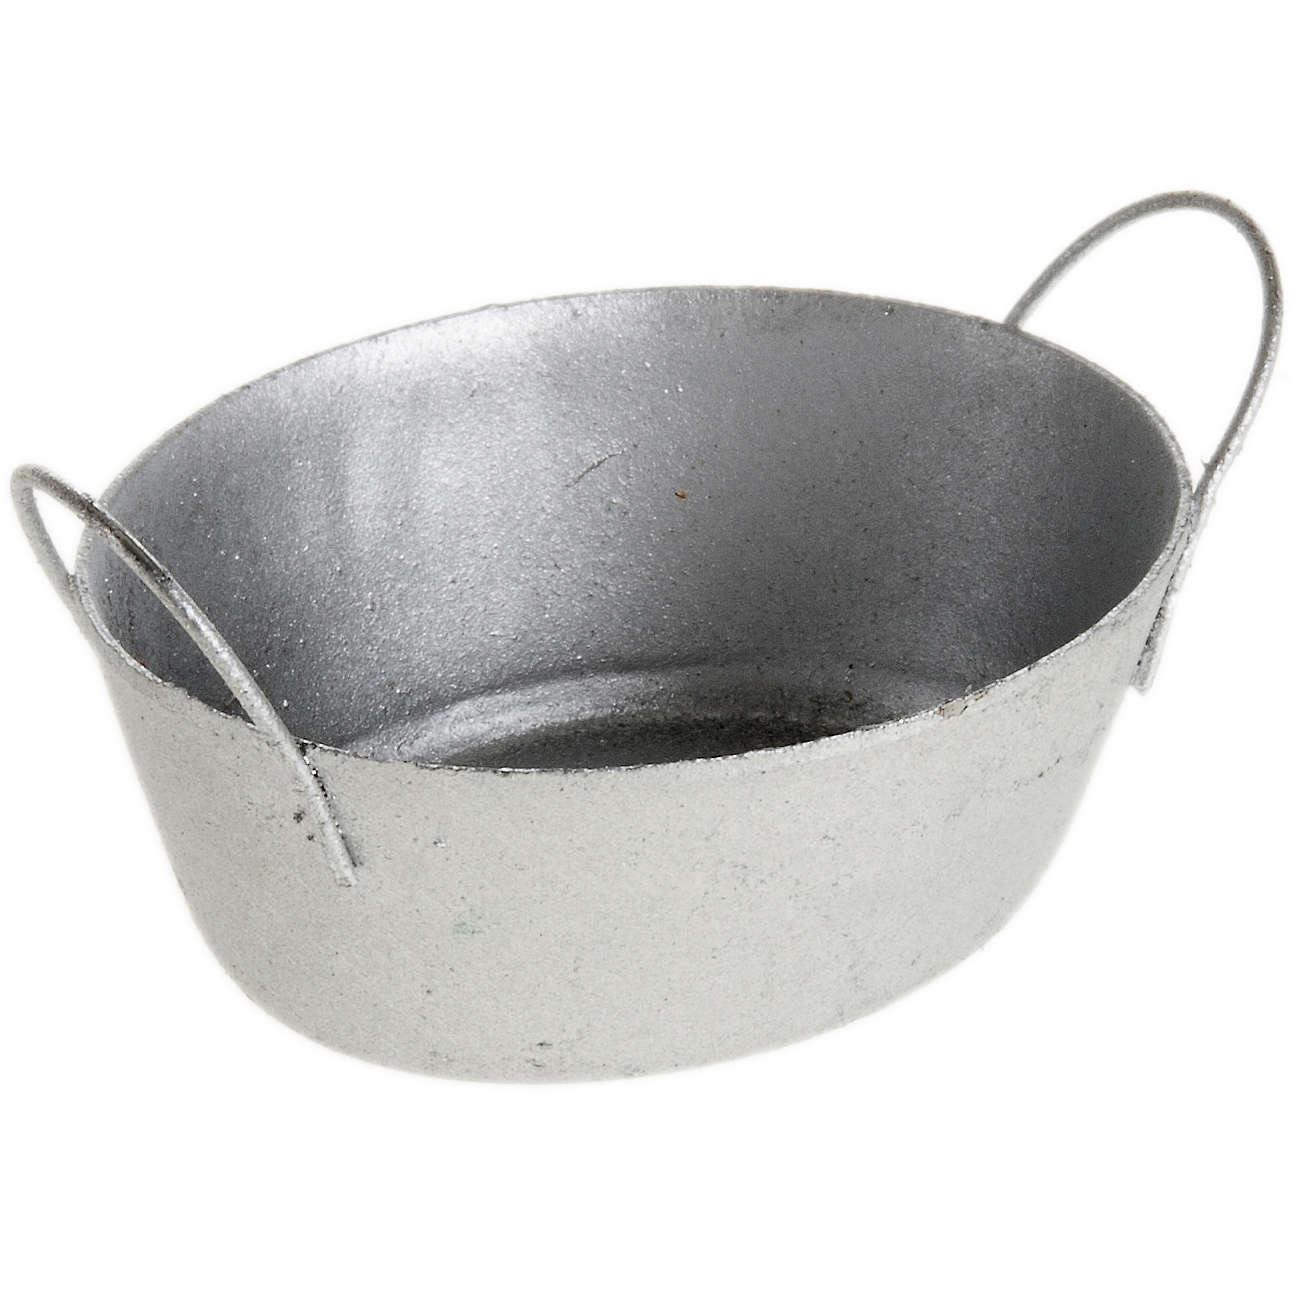 Bacinella metallo presepe 4